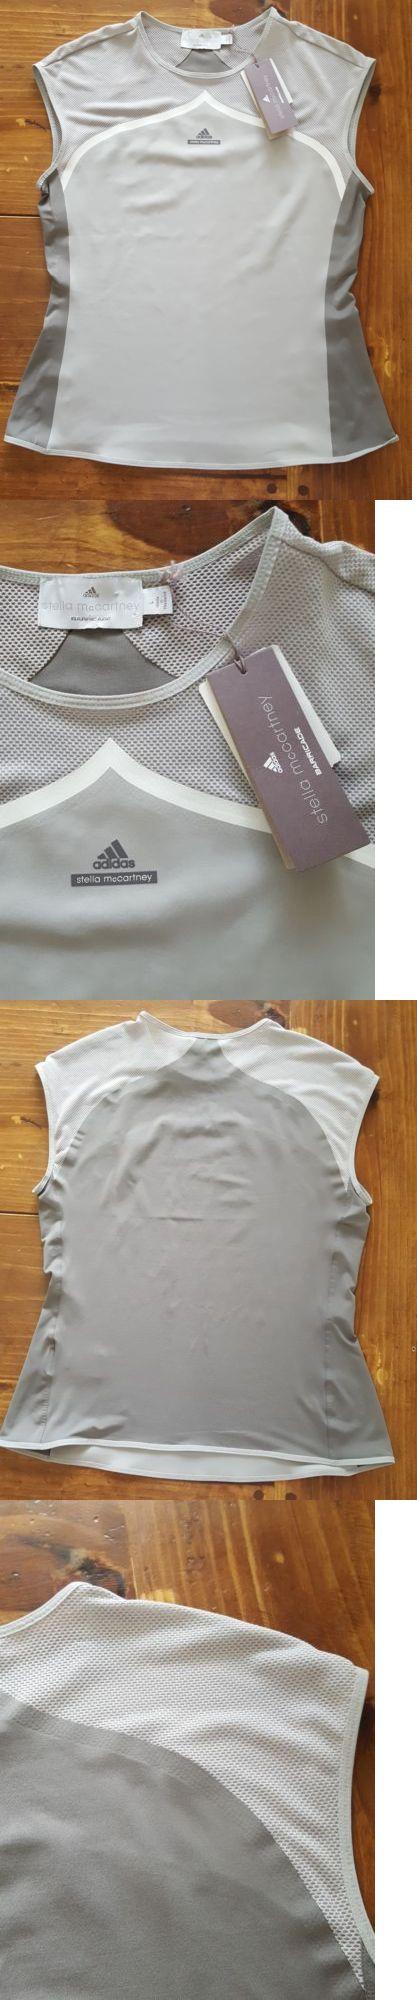 Women Athletics: Adidas Stella Mccartney Barricade Tennis Top Gray Mesh Fitness Size L Nwt -> BUY IT NOW ONLY: $39.95 on eBay!